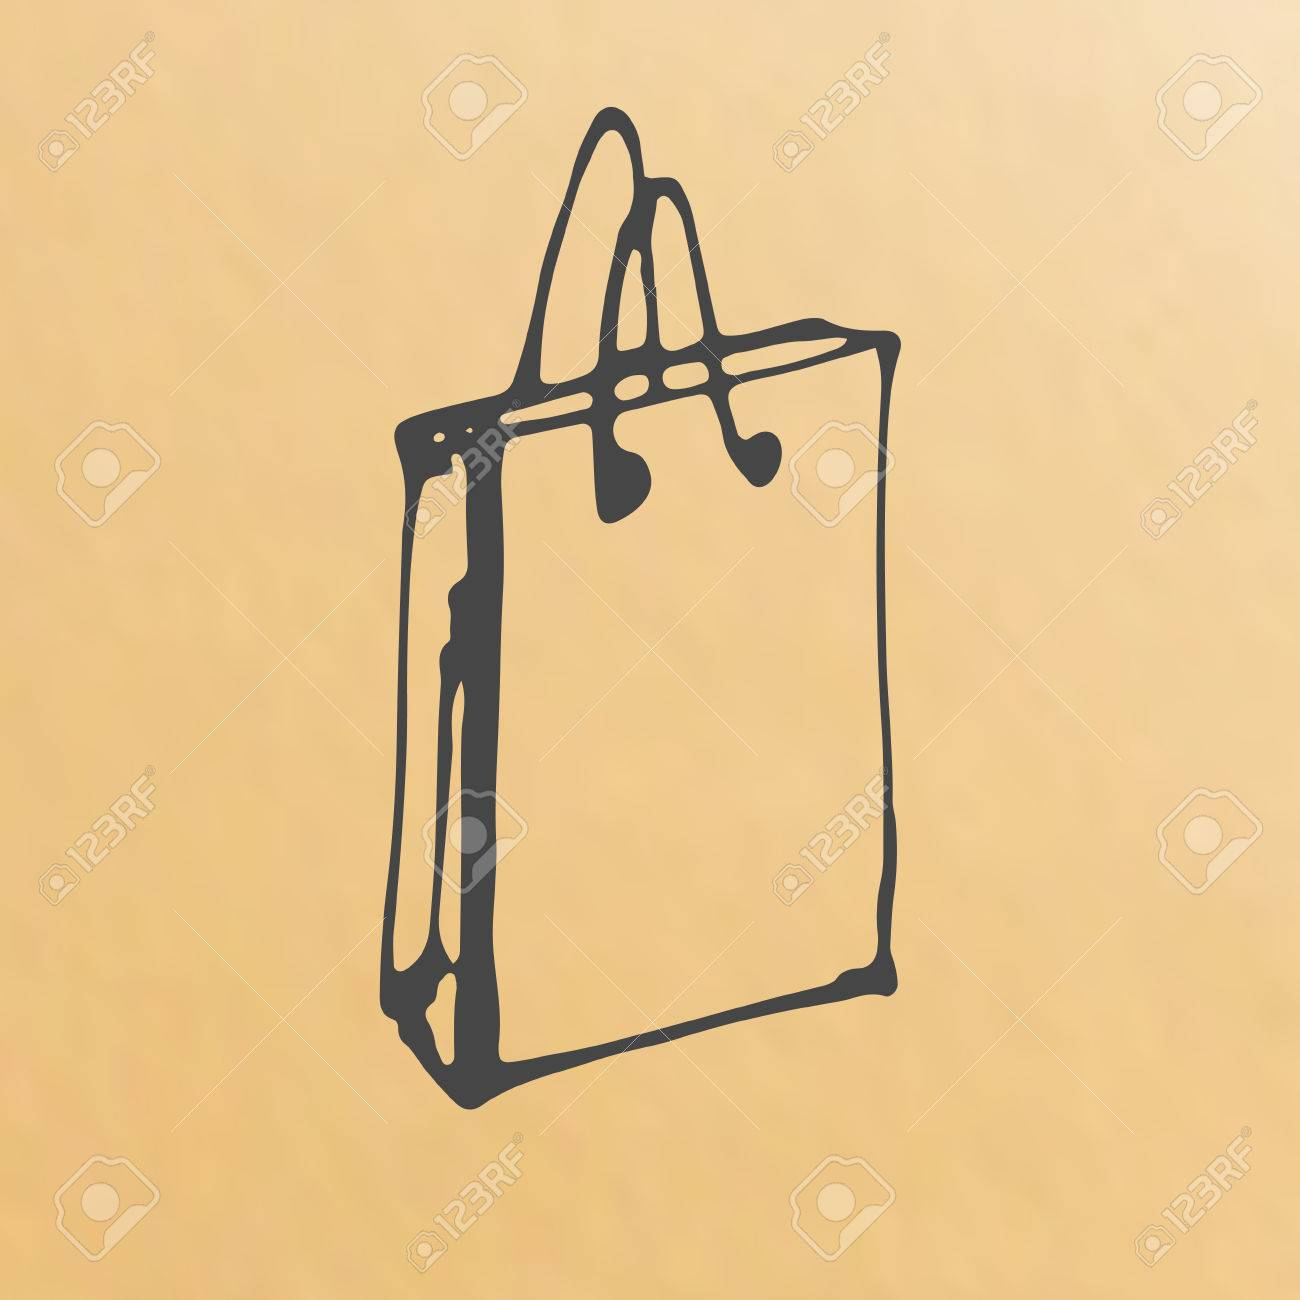 Paper bag sketch - Vector Paper Bag Sketch Packing